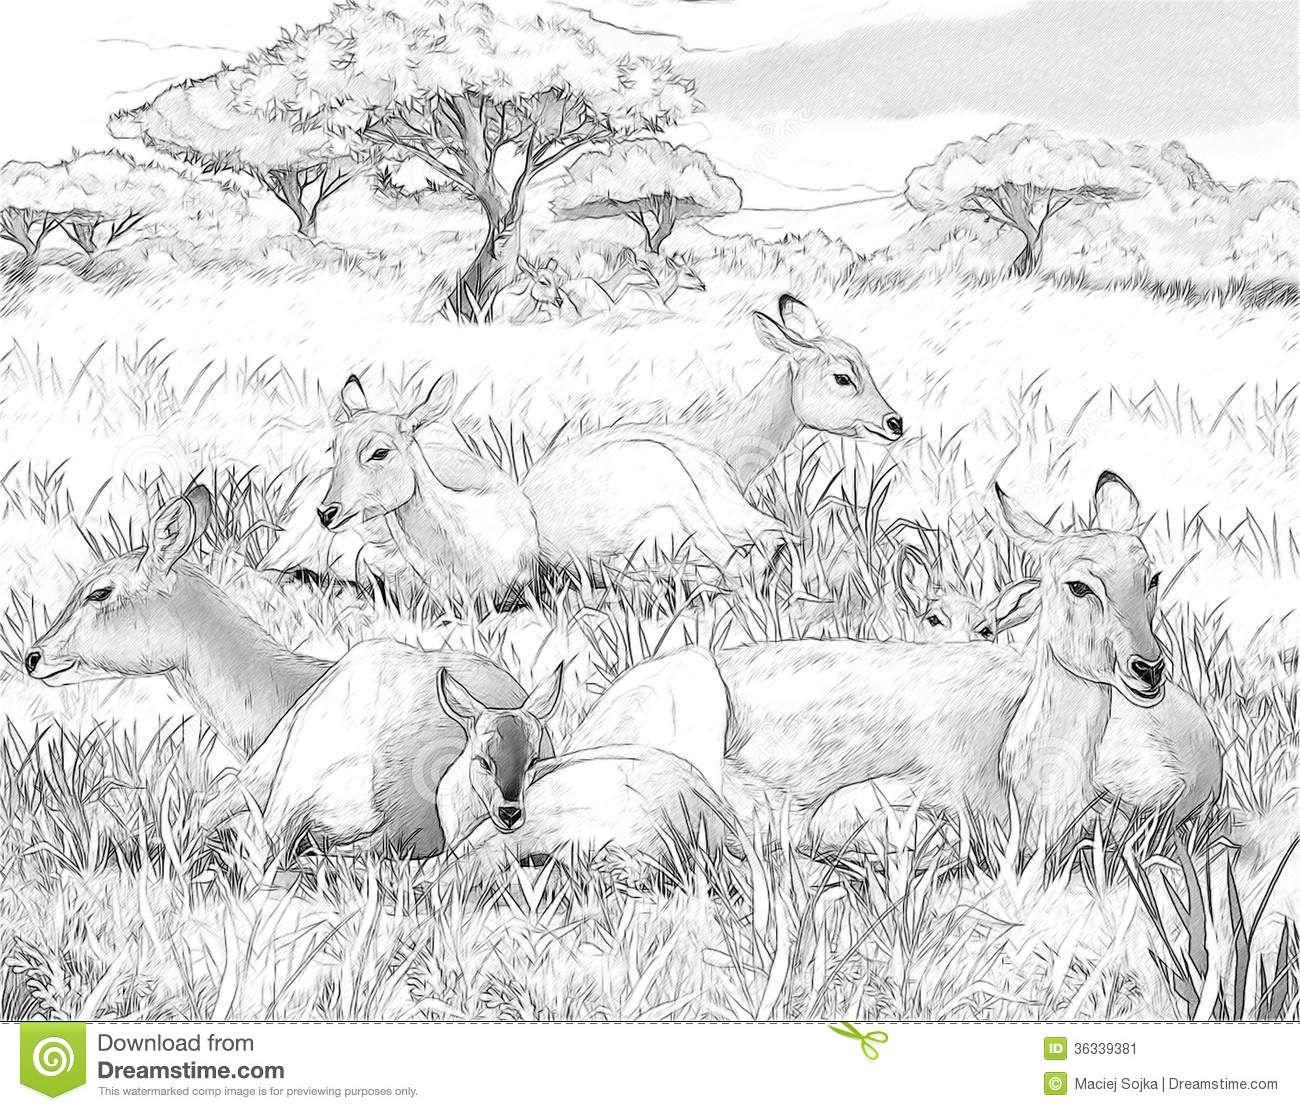 Free coloring pages landscapes - Coloring Pages Landscapes Cerca Con Google